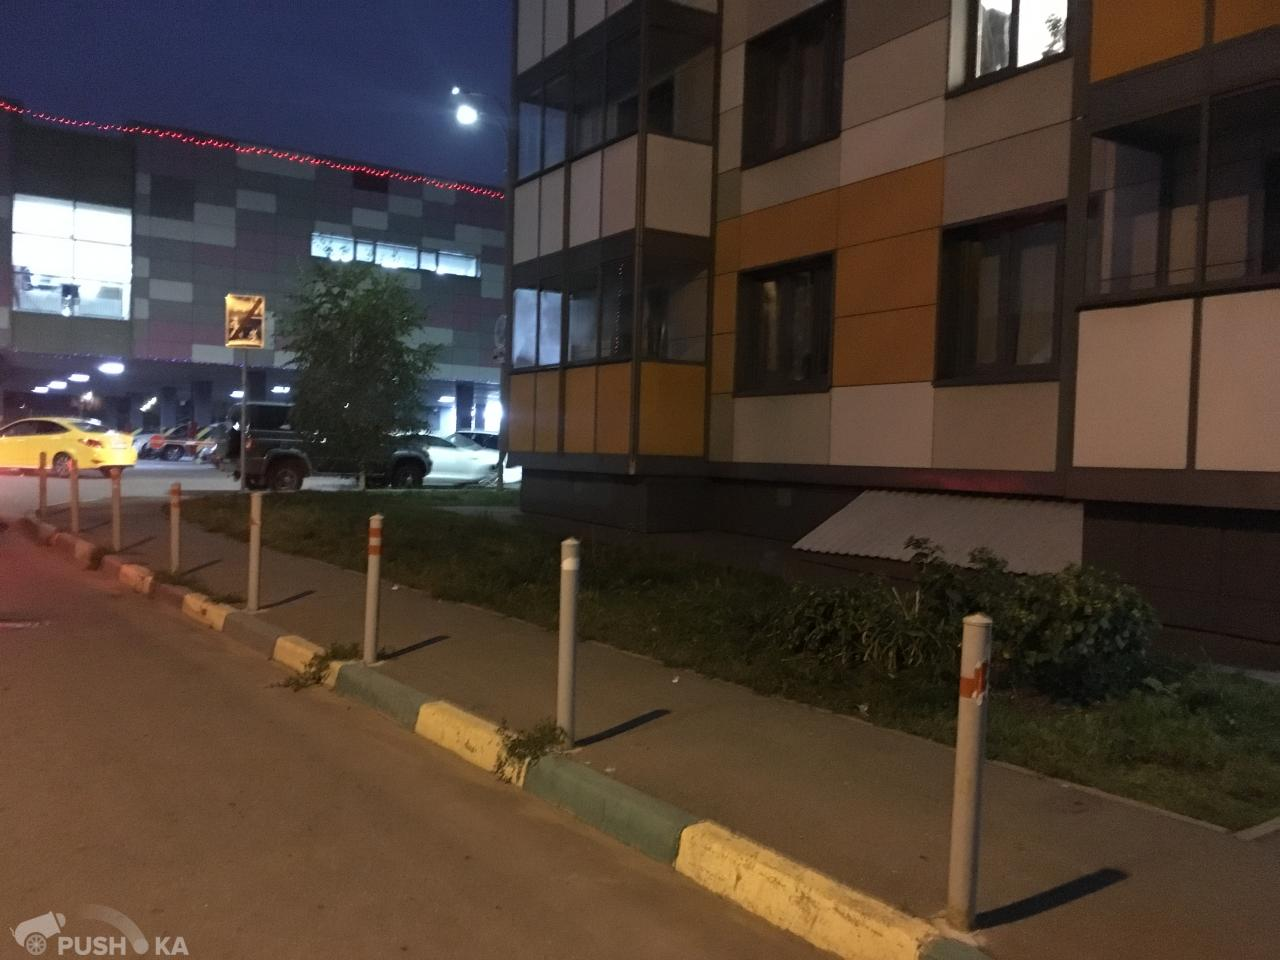 Продаётся 1-комнатная квартира 34.0 кв.м. этаж 5/5 за 3 600 000 руб